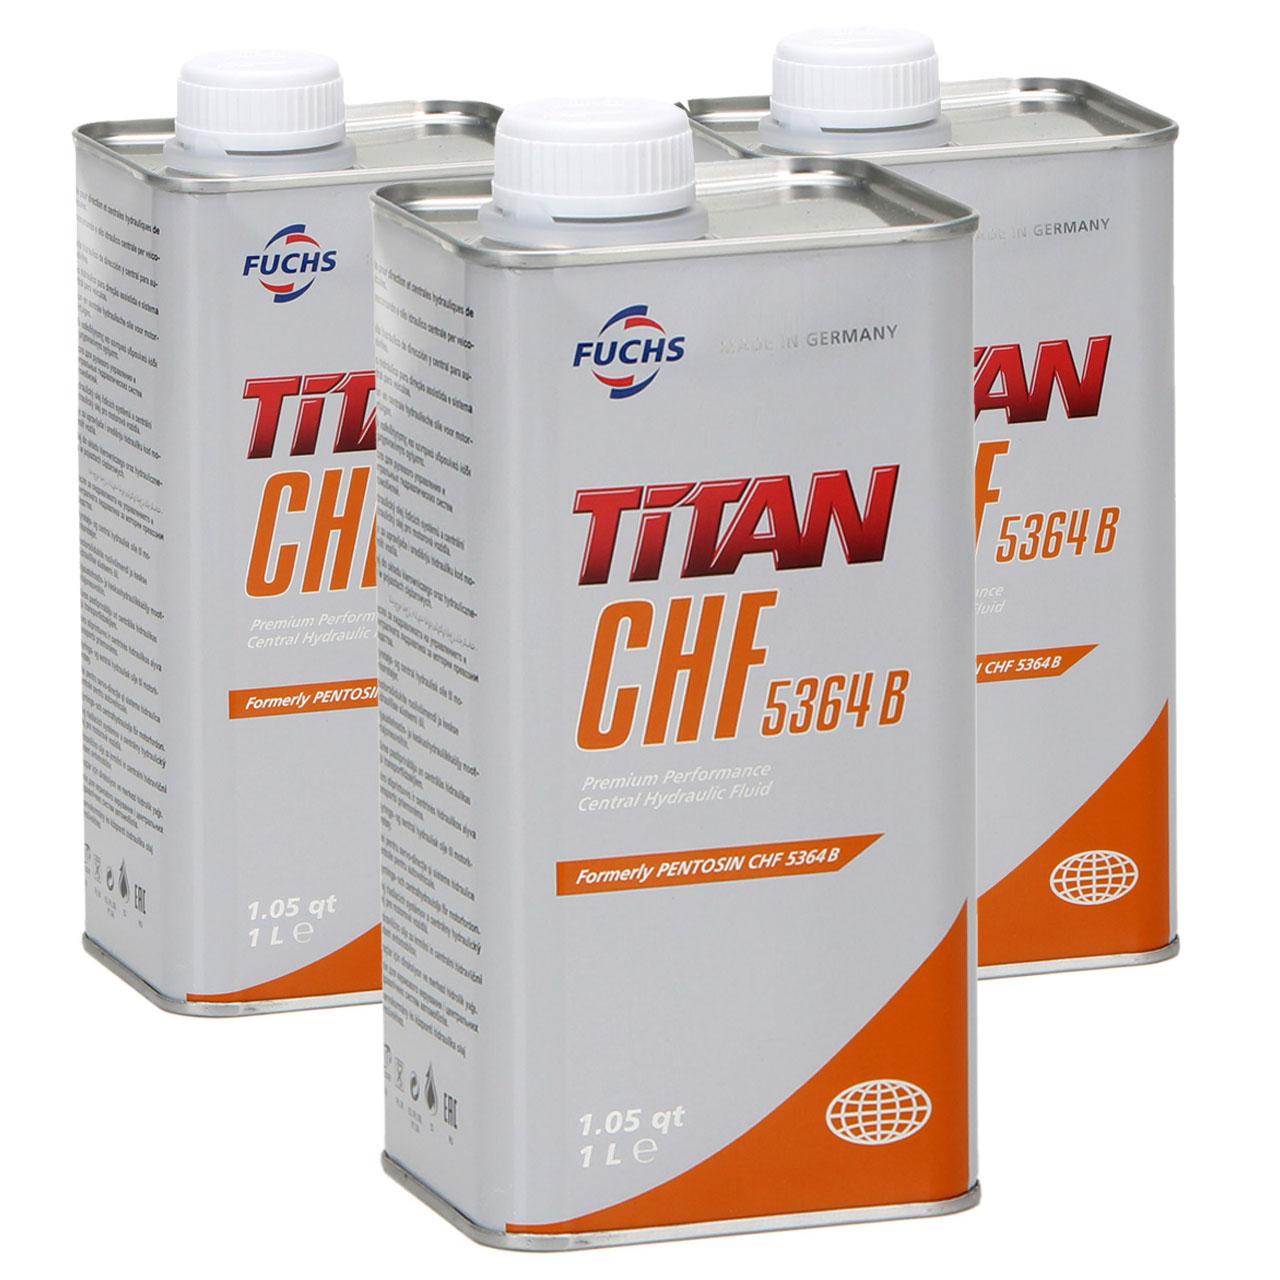 FUCHS Pentosin TITAN Hydrauliköl Zentralhydrauliköl CHF 5364B - 3L 3 Liter